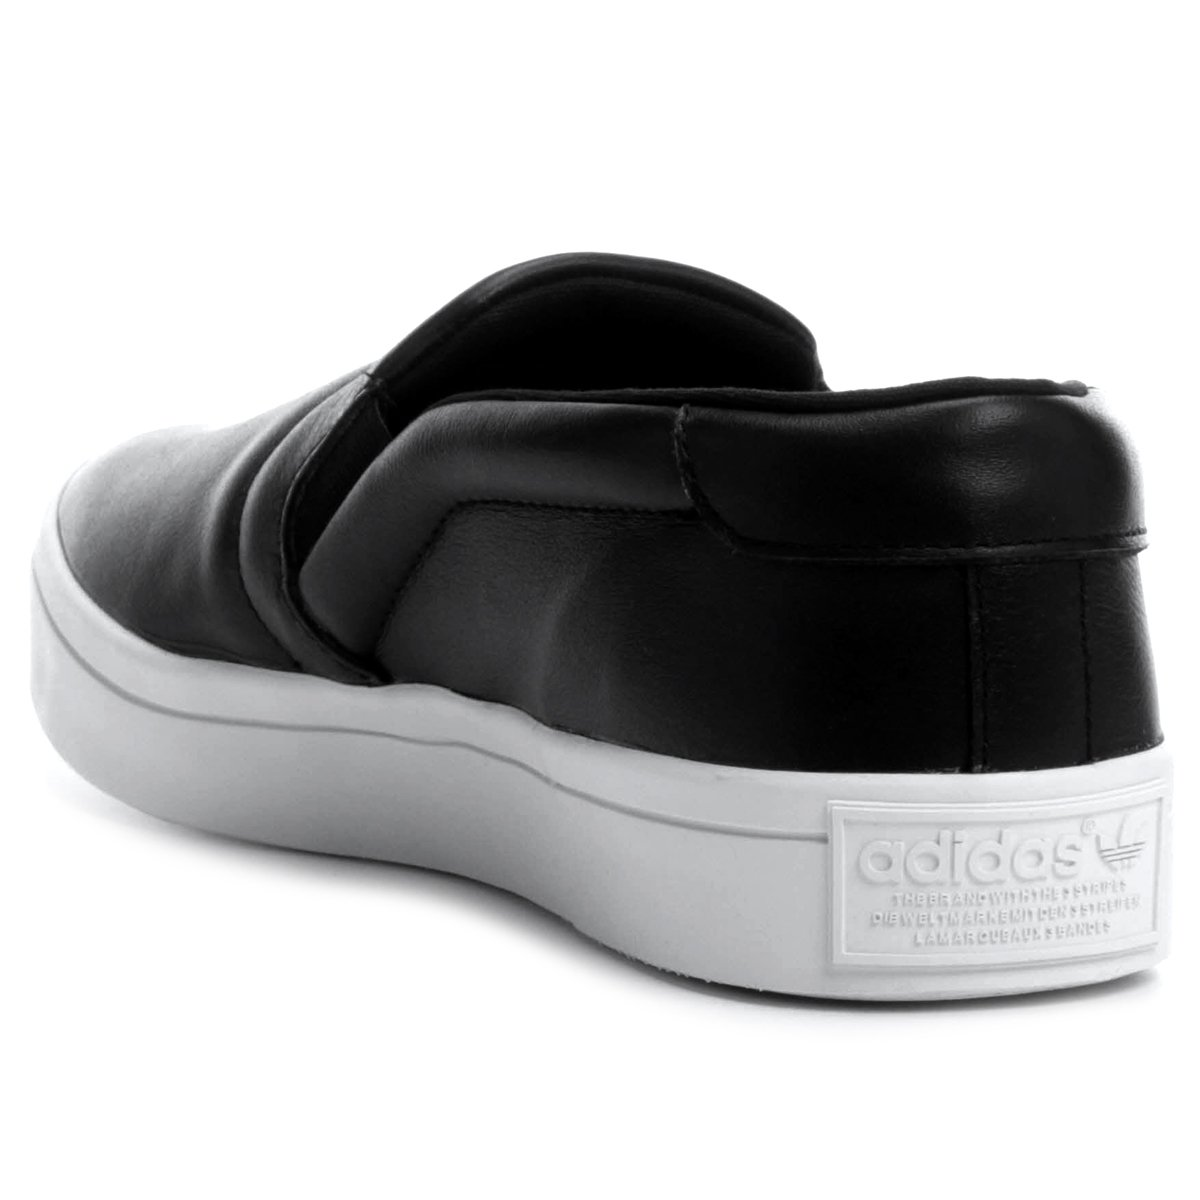 f08cc9af790 ... Tênis Adidas Courtvantage Slip On W - Preto+Branco. FEMININO  COLLECTION